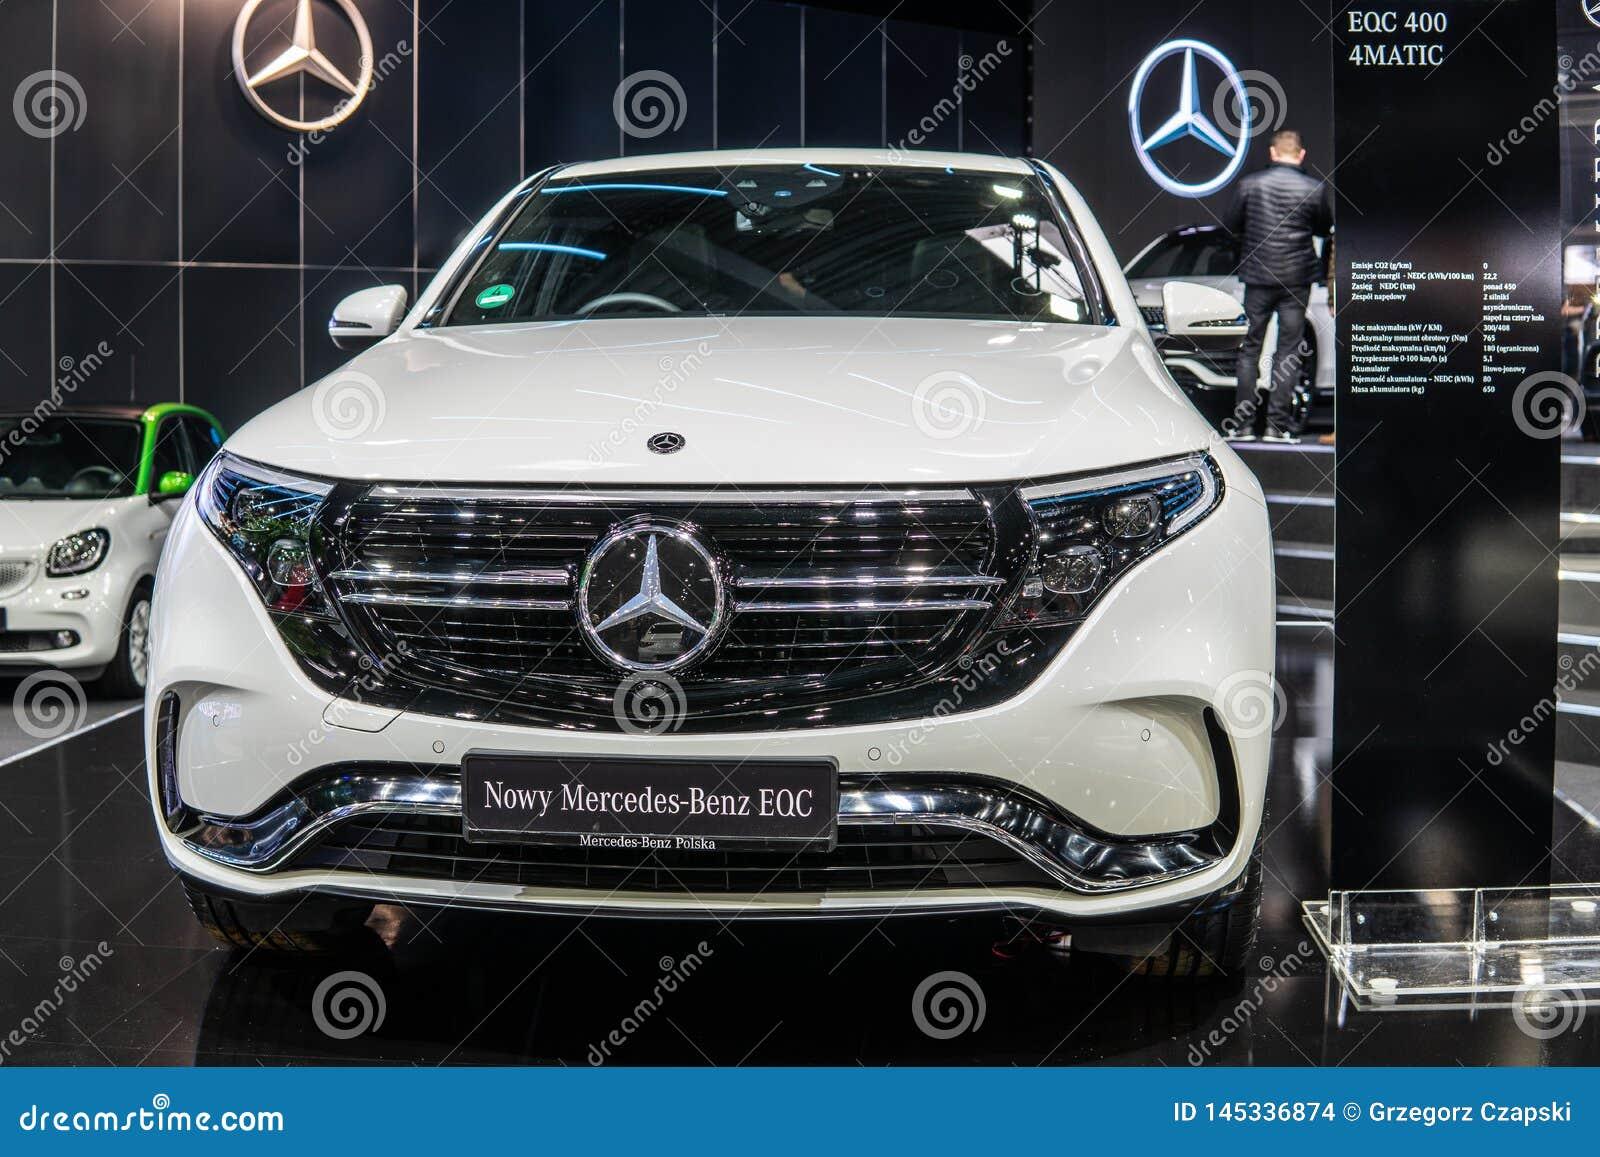 Electric Mercedes-Benz EQC 400 4Matic 300kW SUV, 2019 model year, EQ brand, EV produced by Mercedes Benz